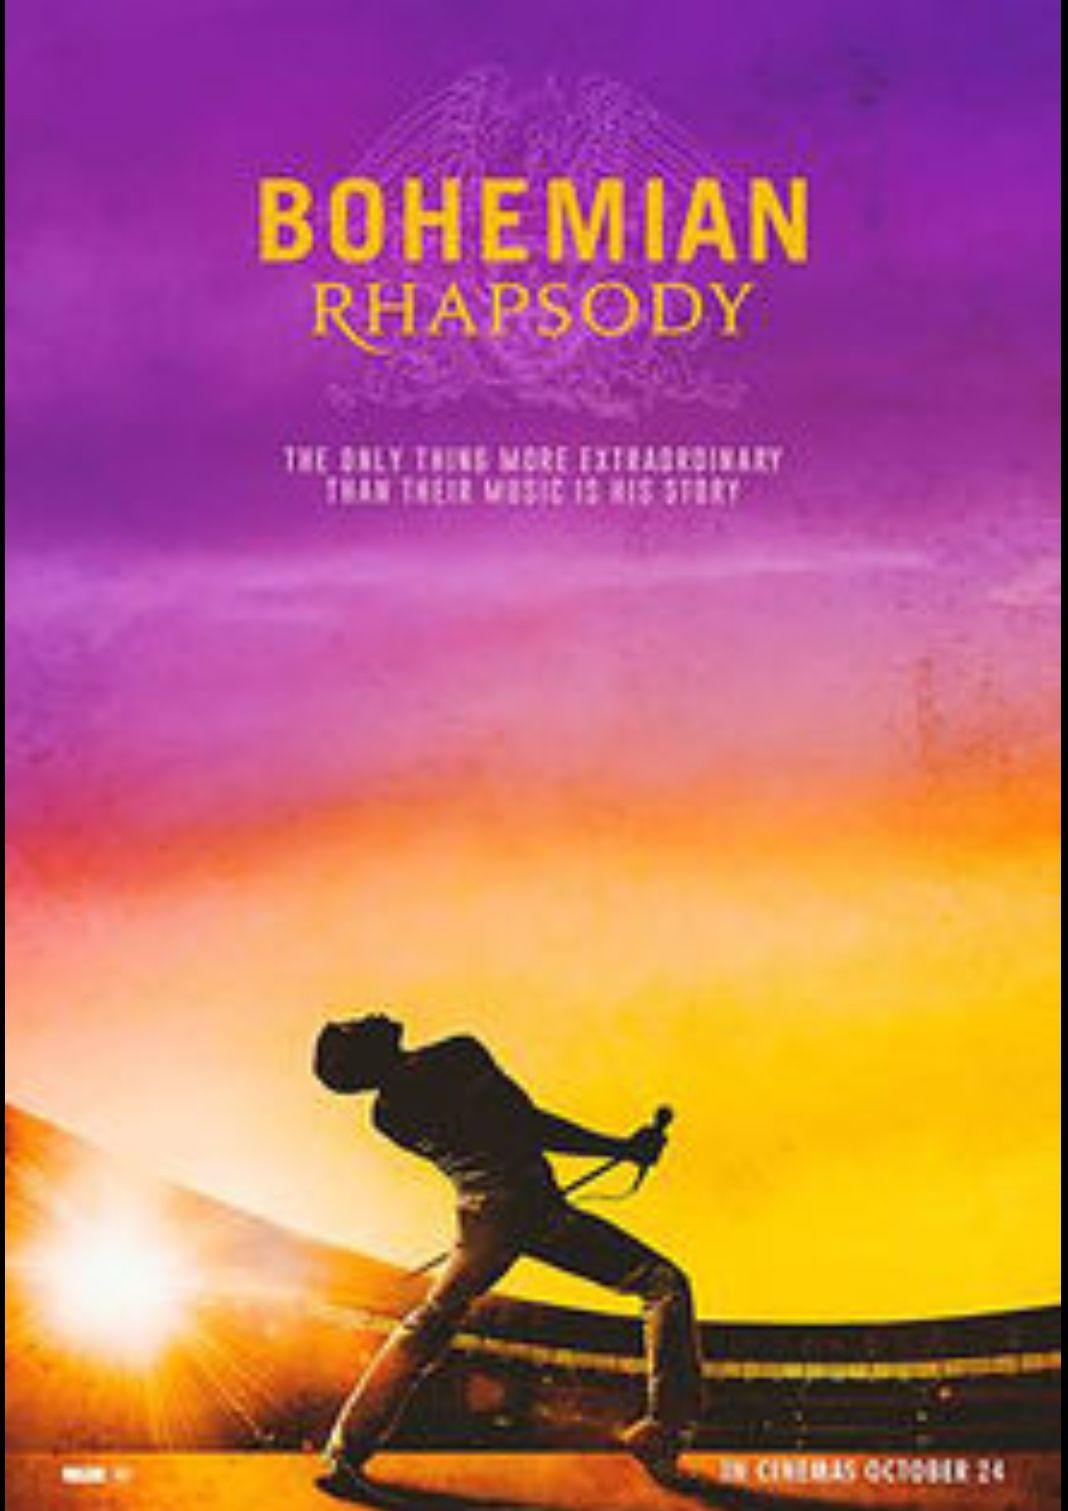 Bohemian Rhapsody Bohemian Rhapsody Free Movies Online Full Movies Online Free